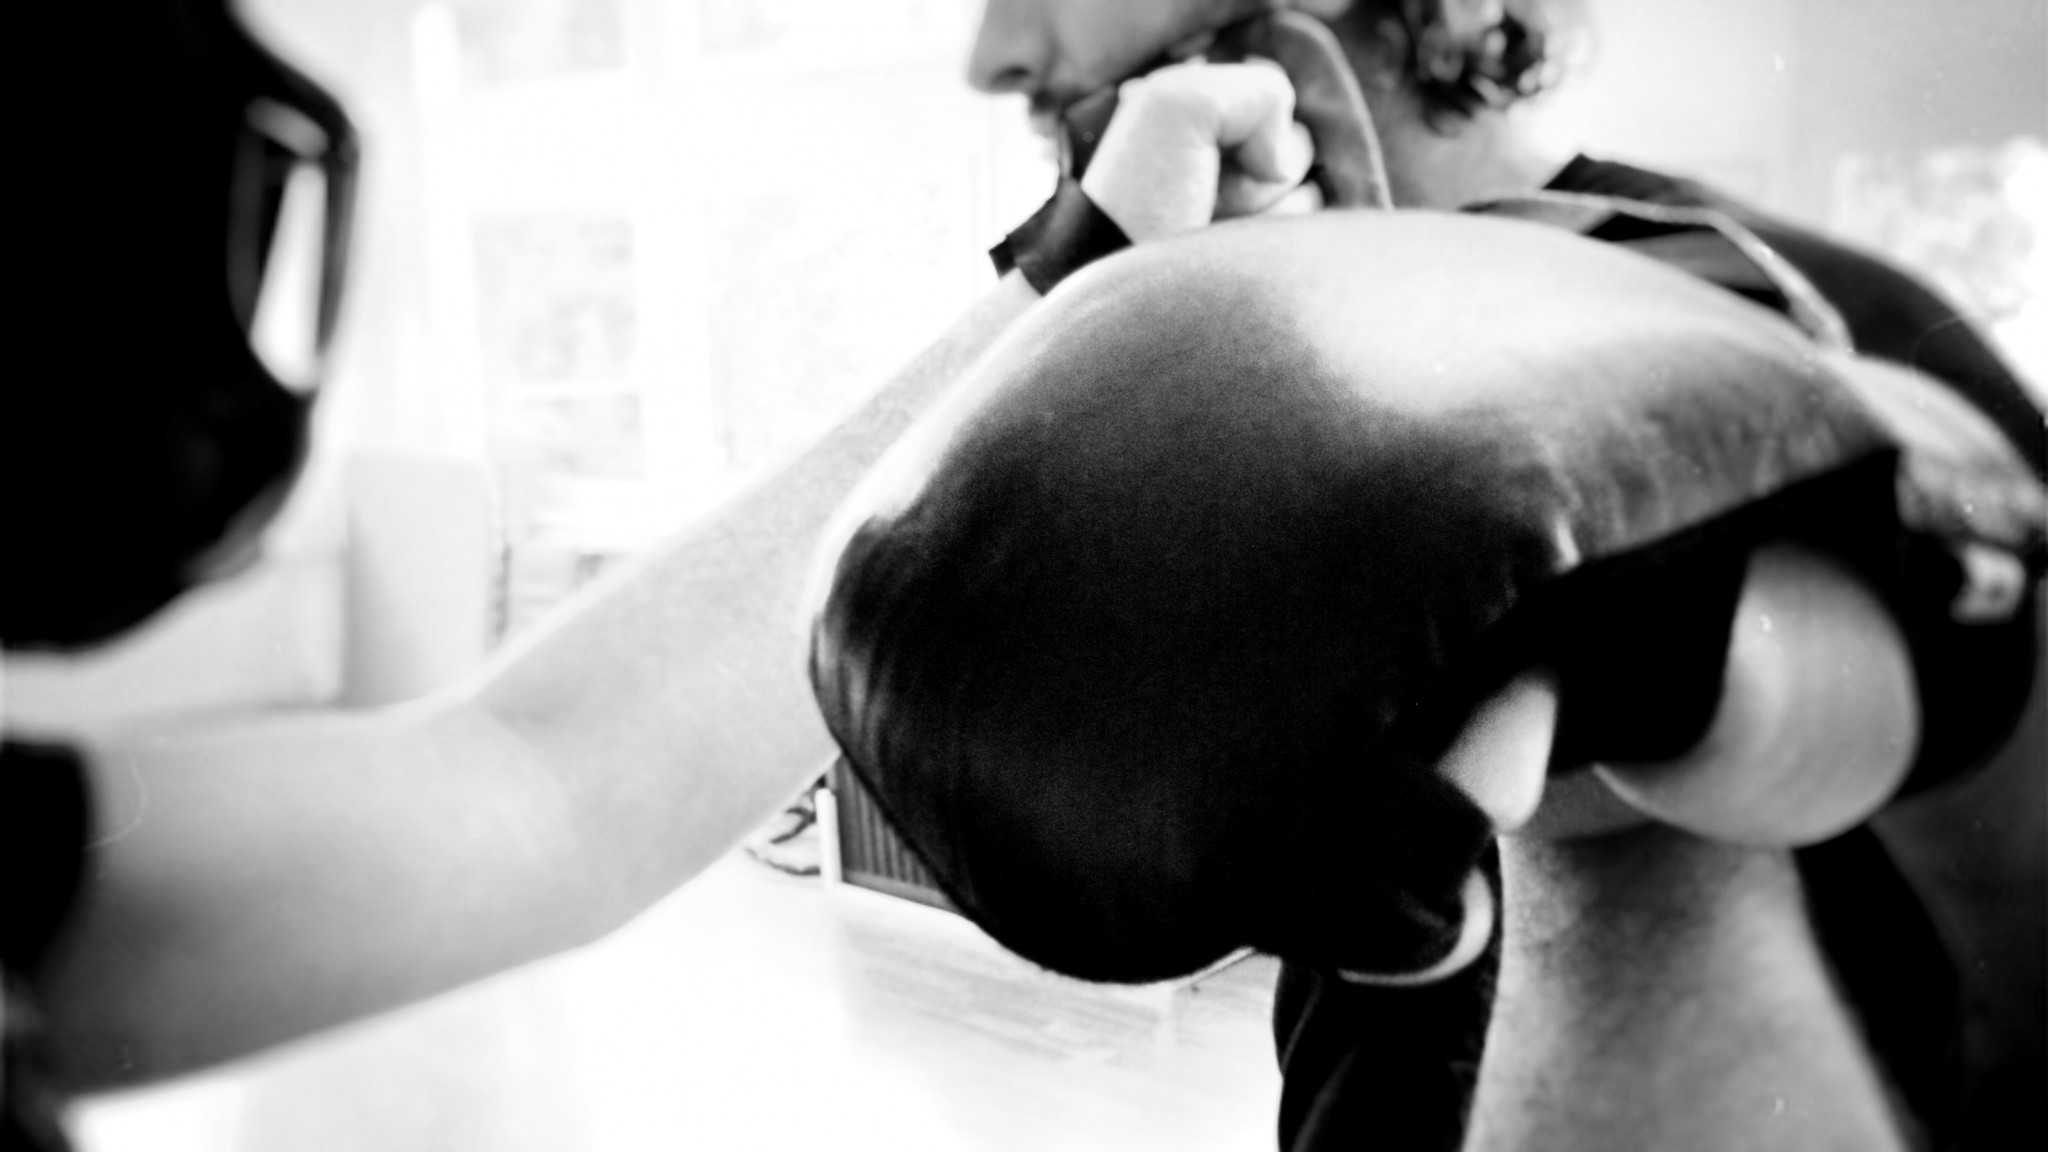 MMA Martial Arts, Kraf Maga, Stuttgart, Bad Cannstatt, Waiblingen, Ludwigsburg, Esslingen